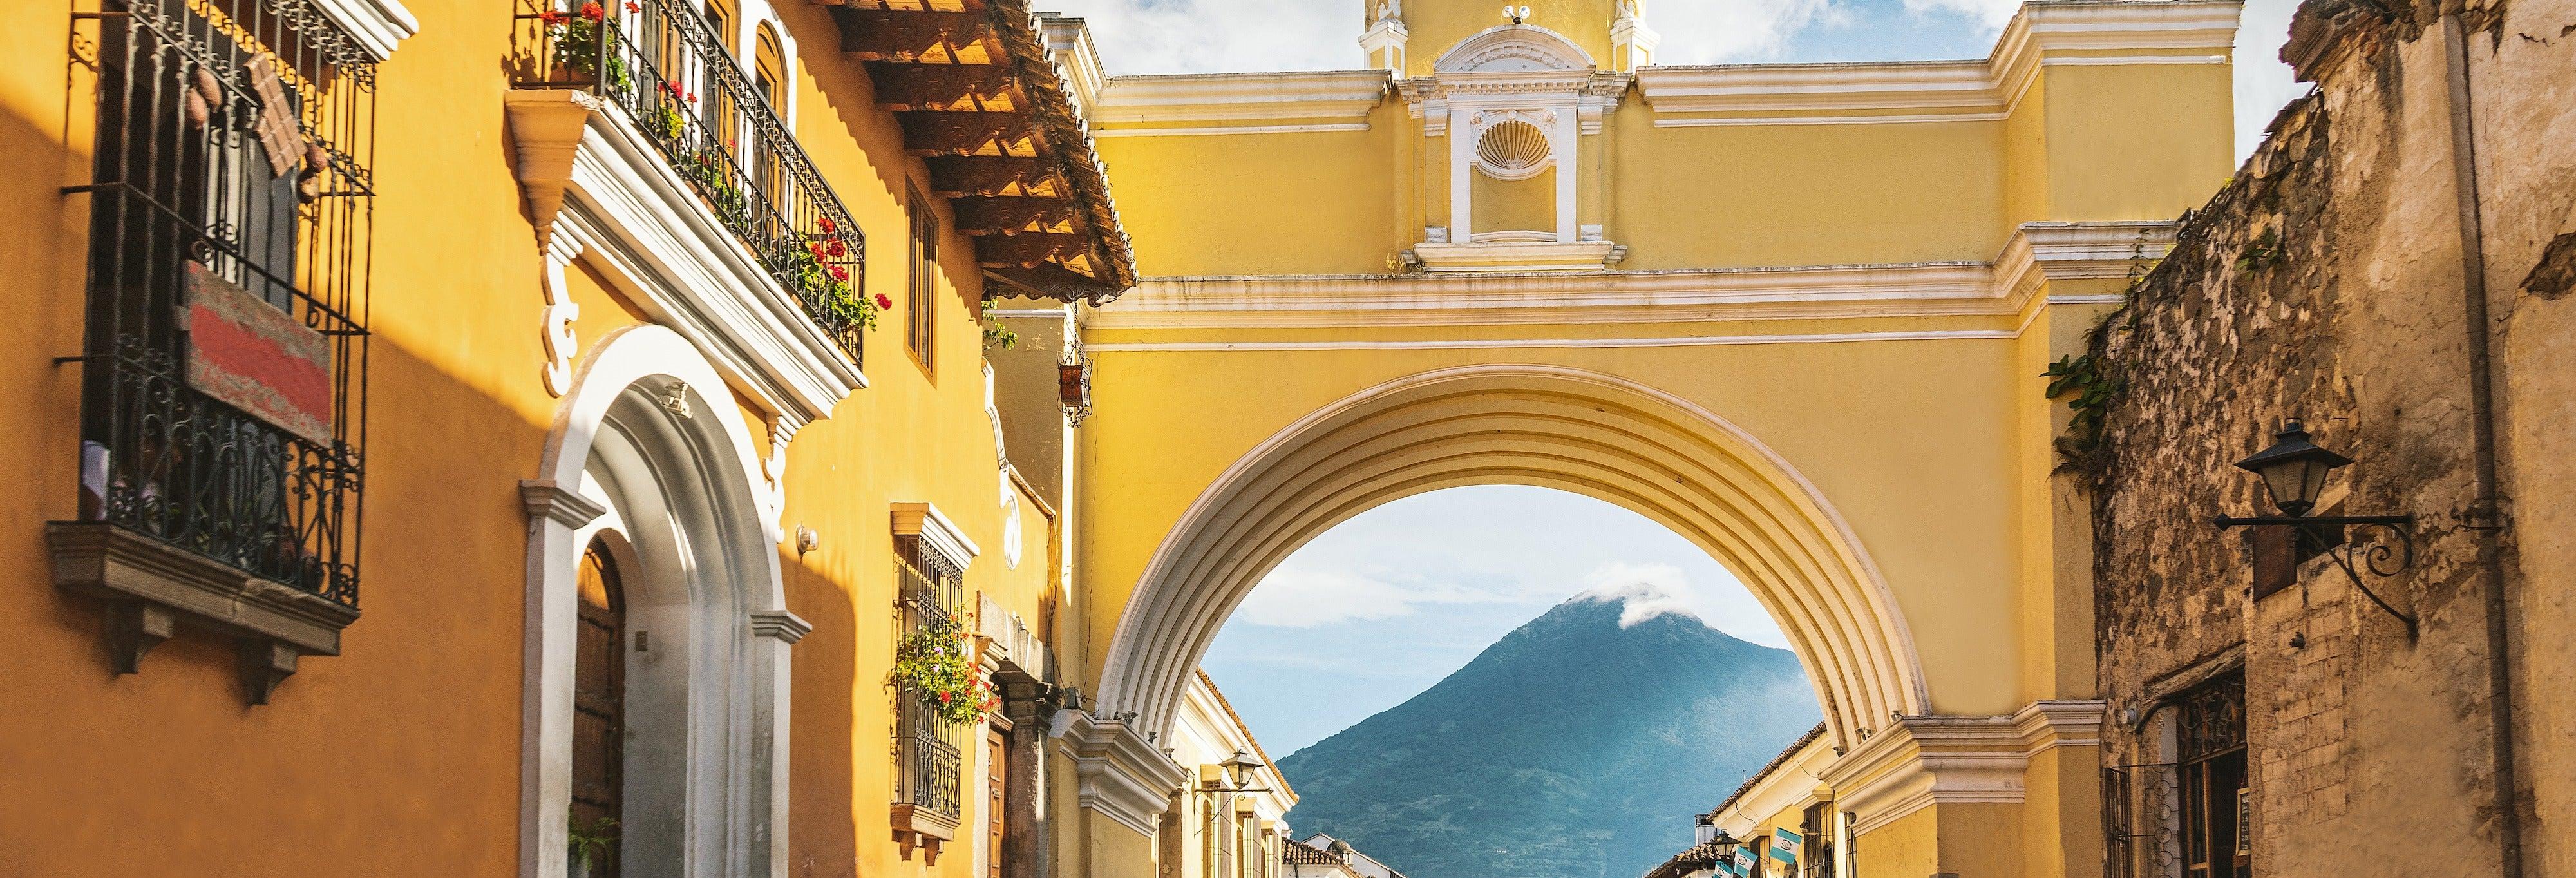 Visita guiada por Antigua Guatemala